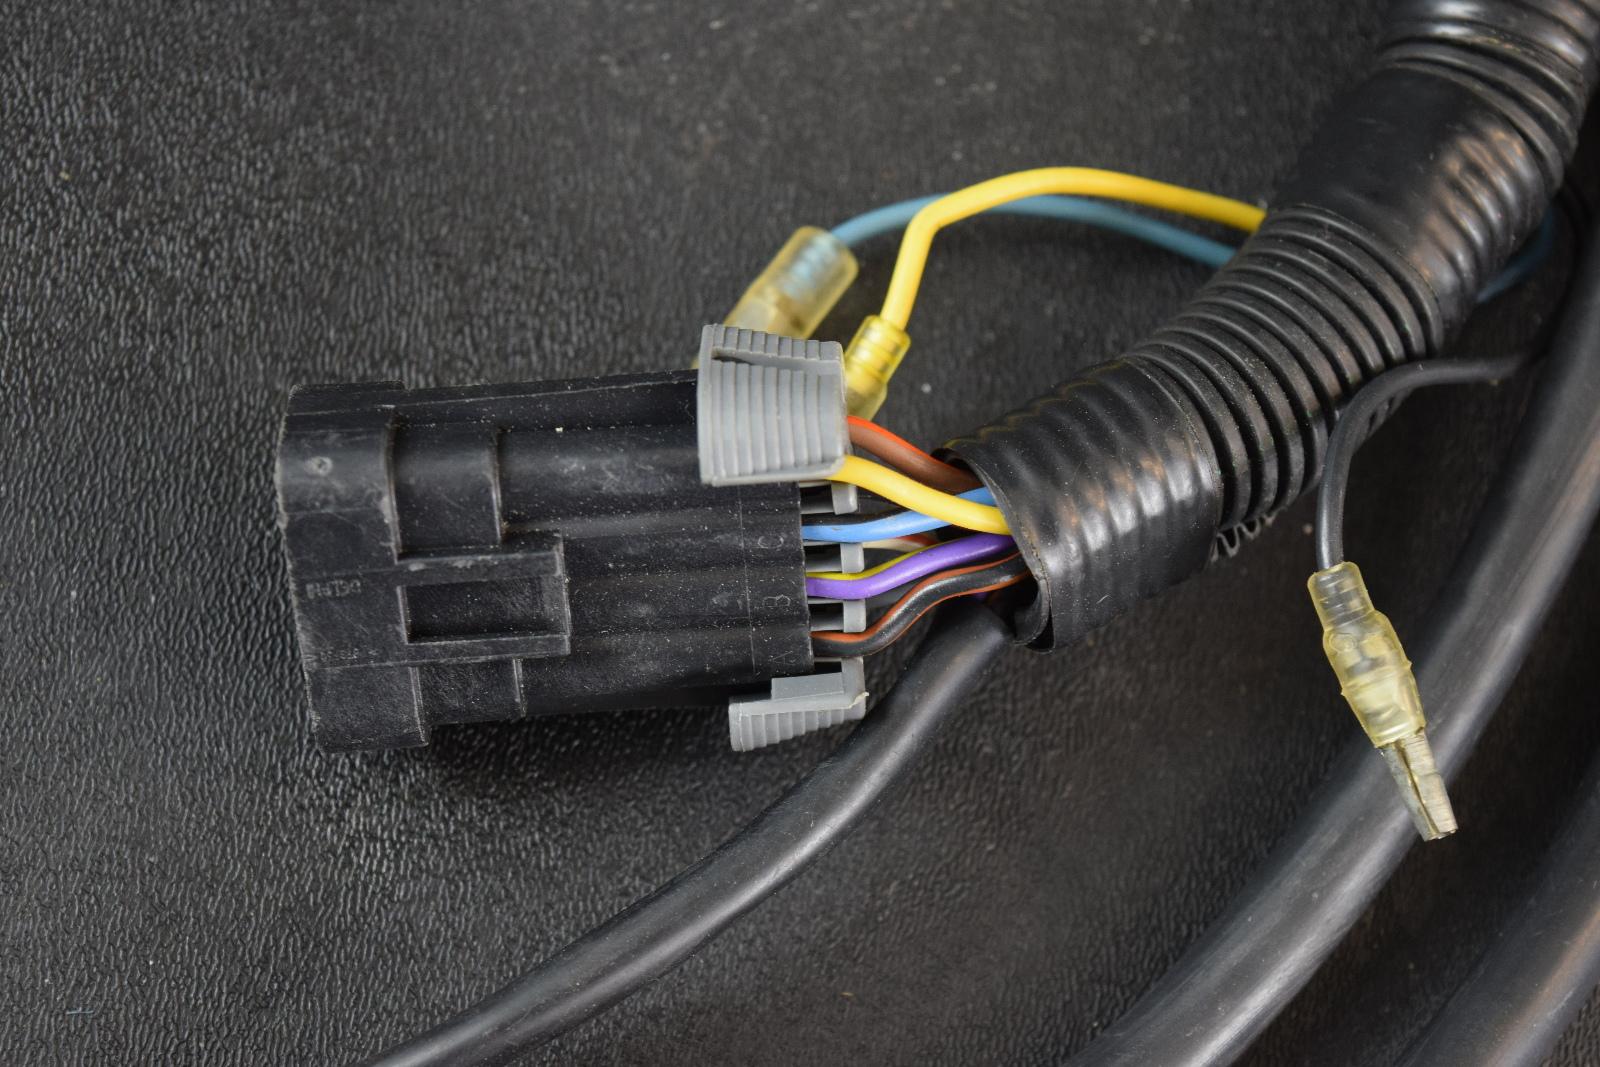 Mercury Smartcraft Wiring Harness